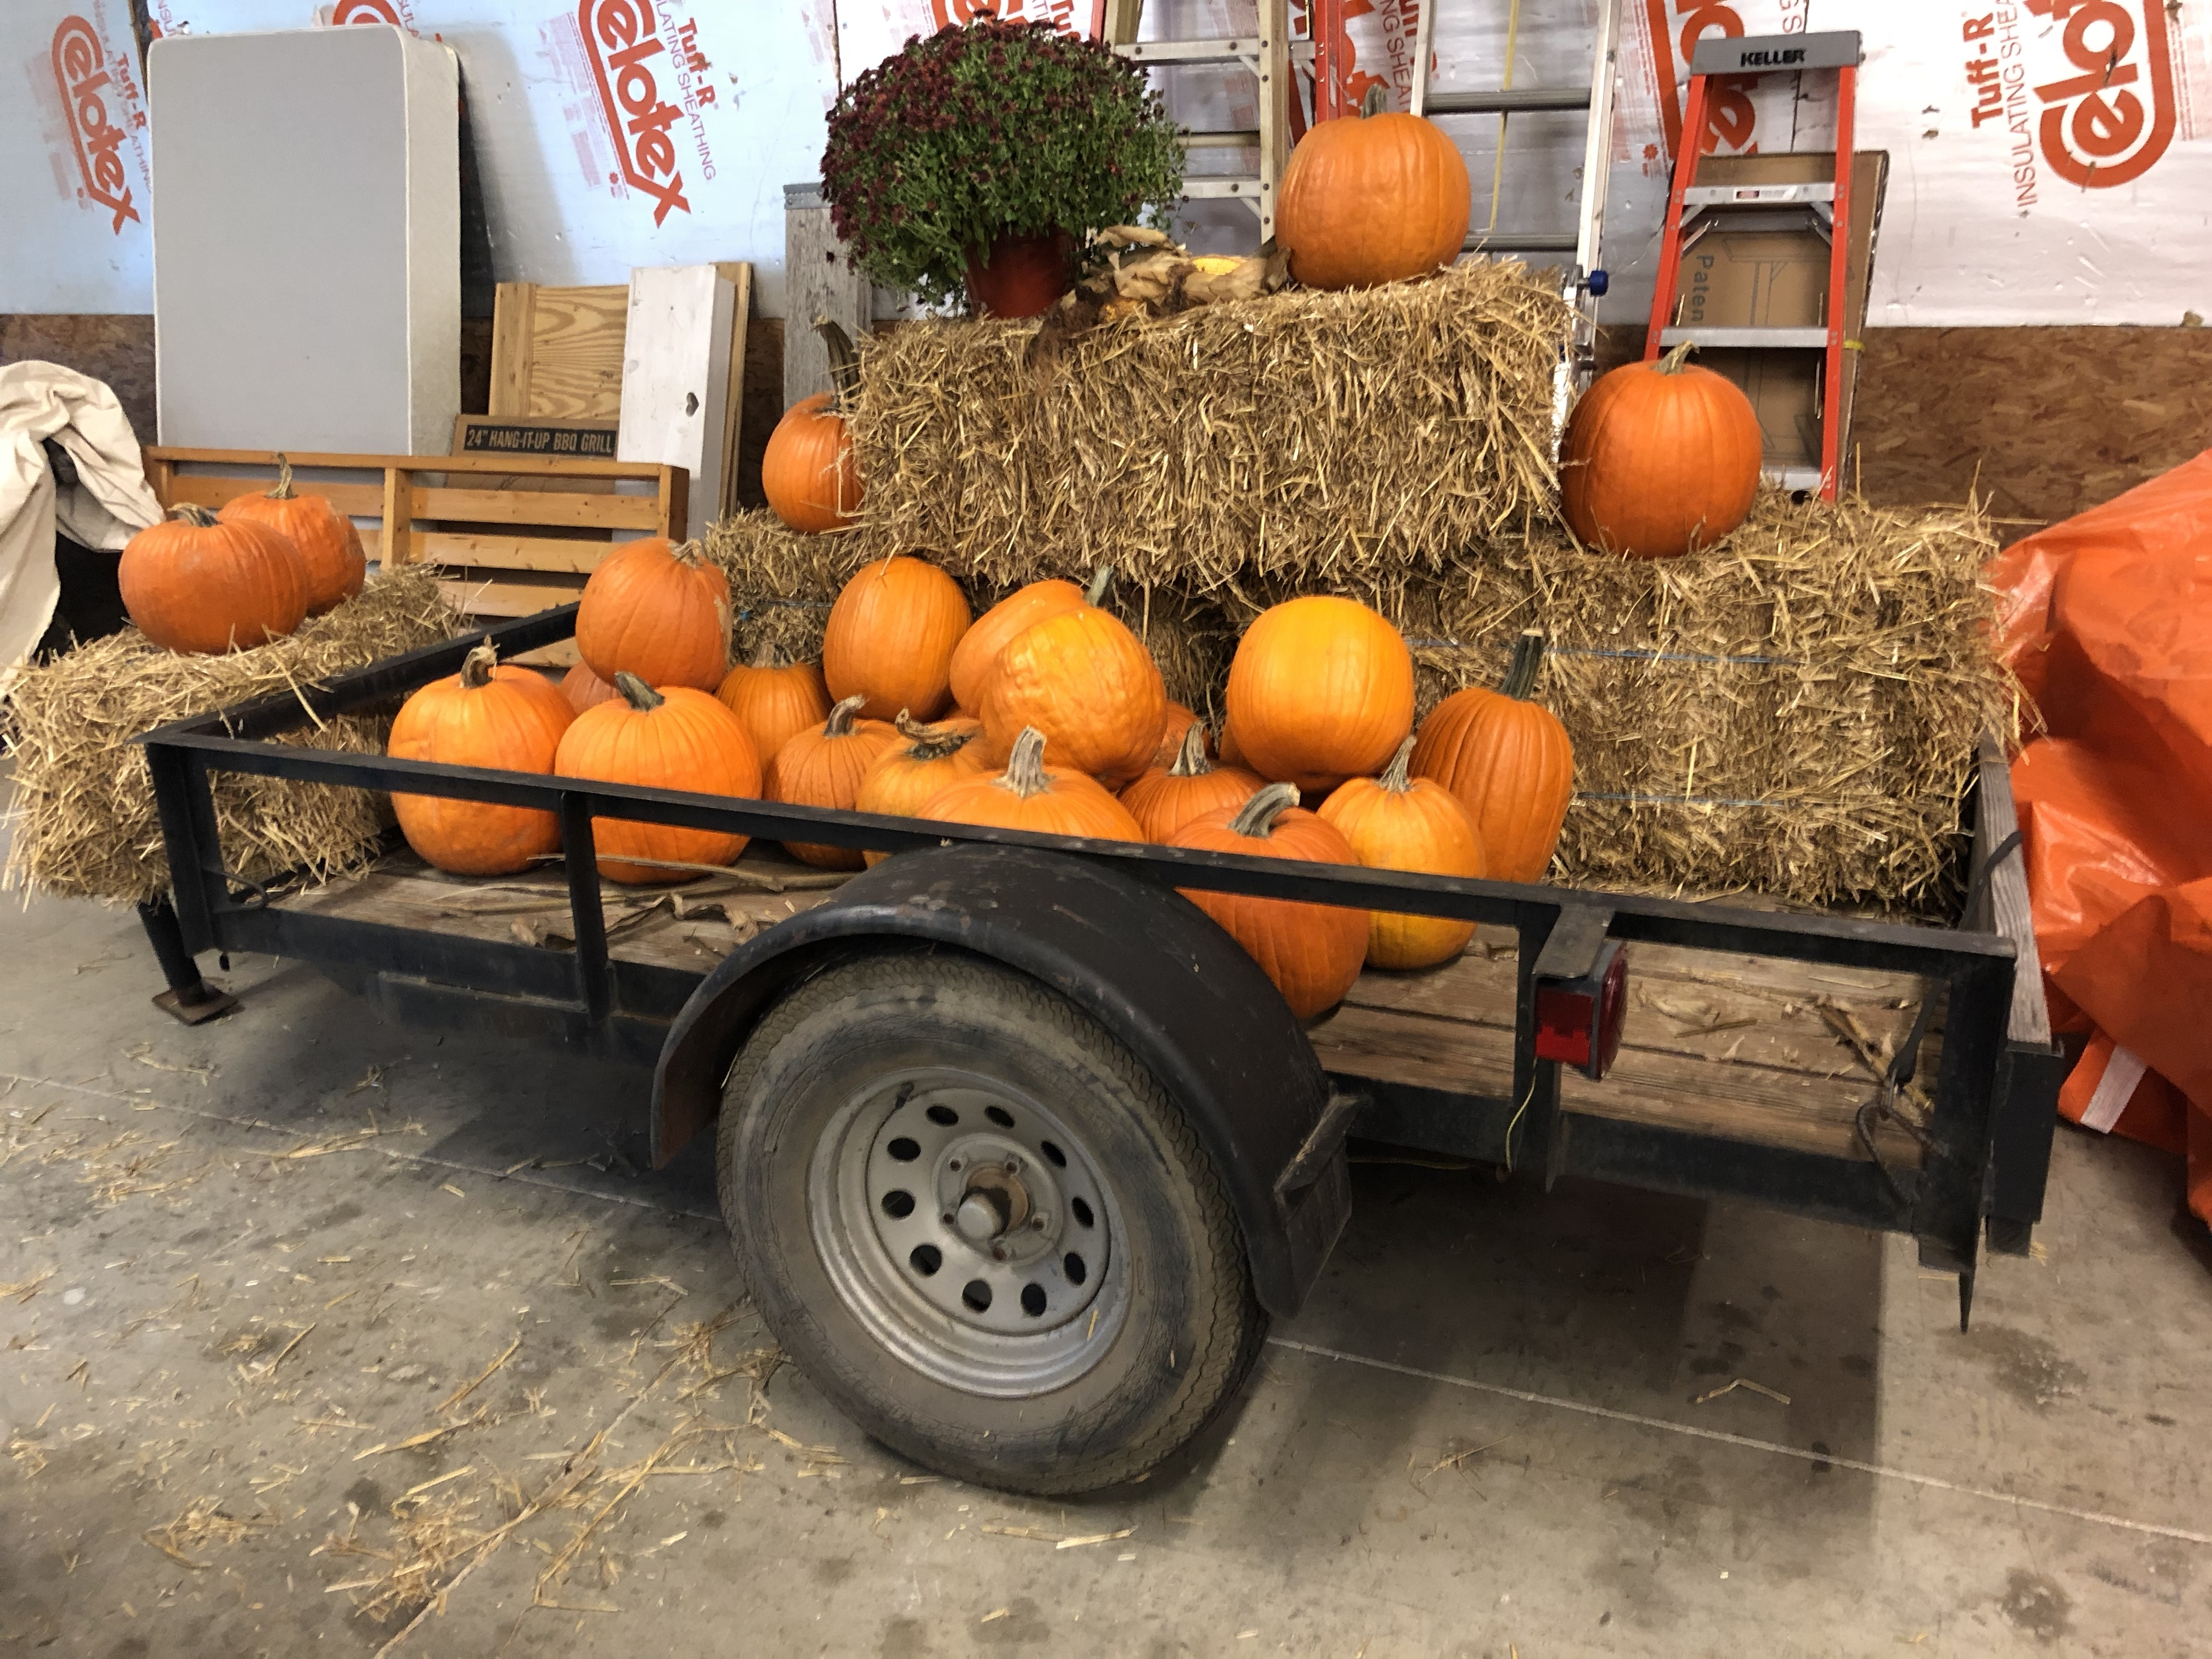 2018 10 Harvest Party Emmanuel Baptist Church